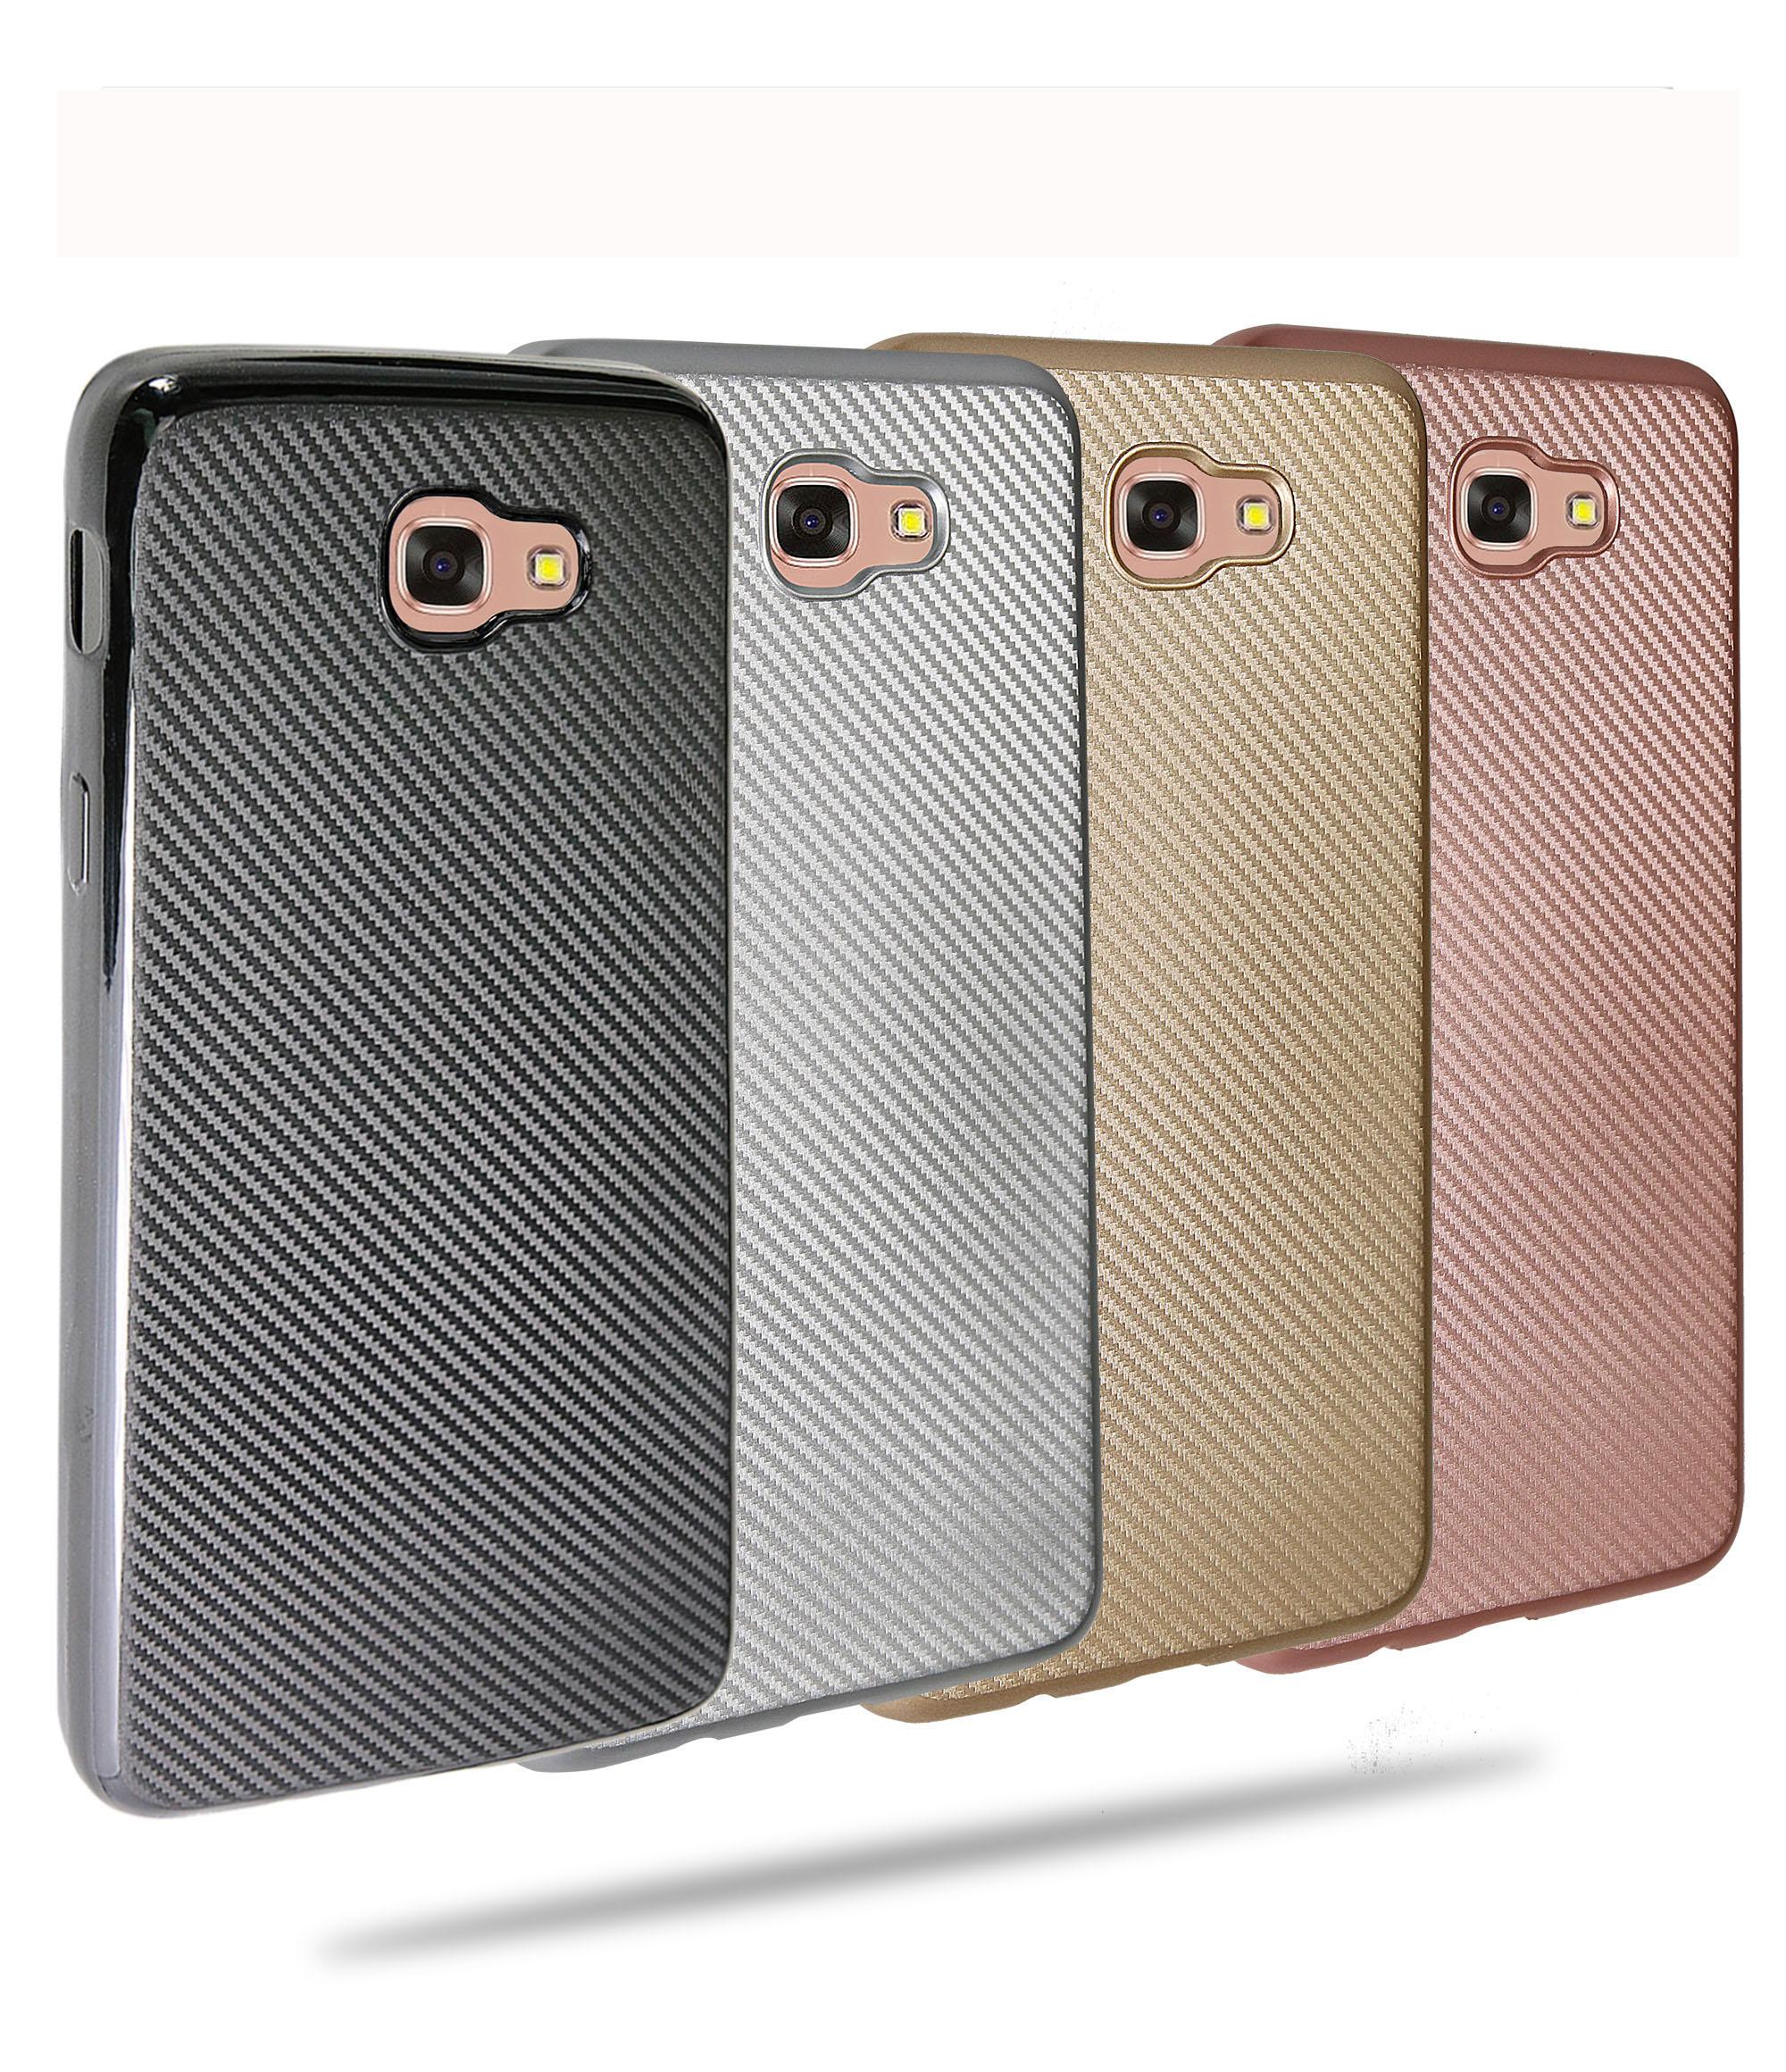 Premium Carbon Fiber Soft Tpu Cover For Samsung Galaxy J1 Mini J5 J7 Softcase Thin Droff Matte Black Prime Back Sillion On5 On7 2016 Case Phone Capa Conque Bag